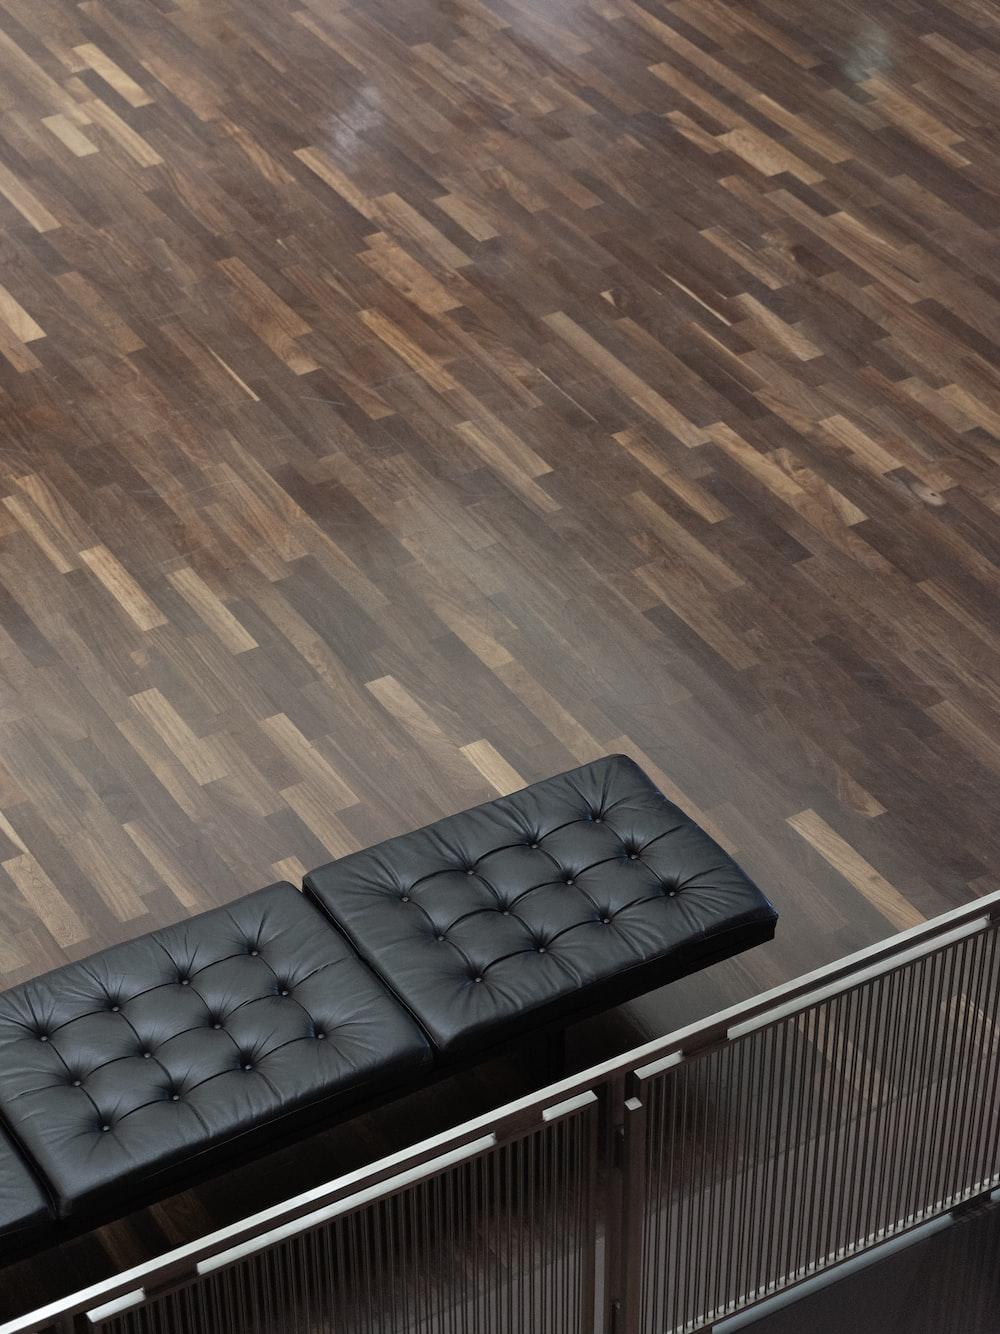 modern tufted black gang chair on parquet floor